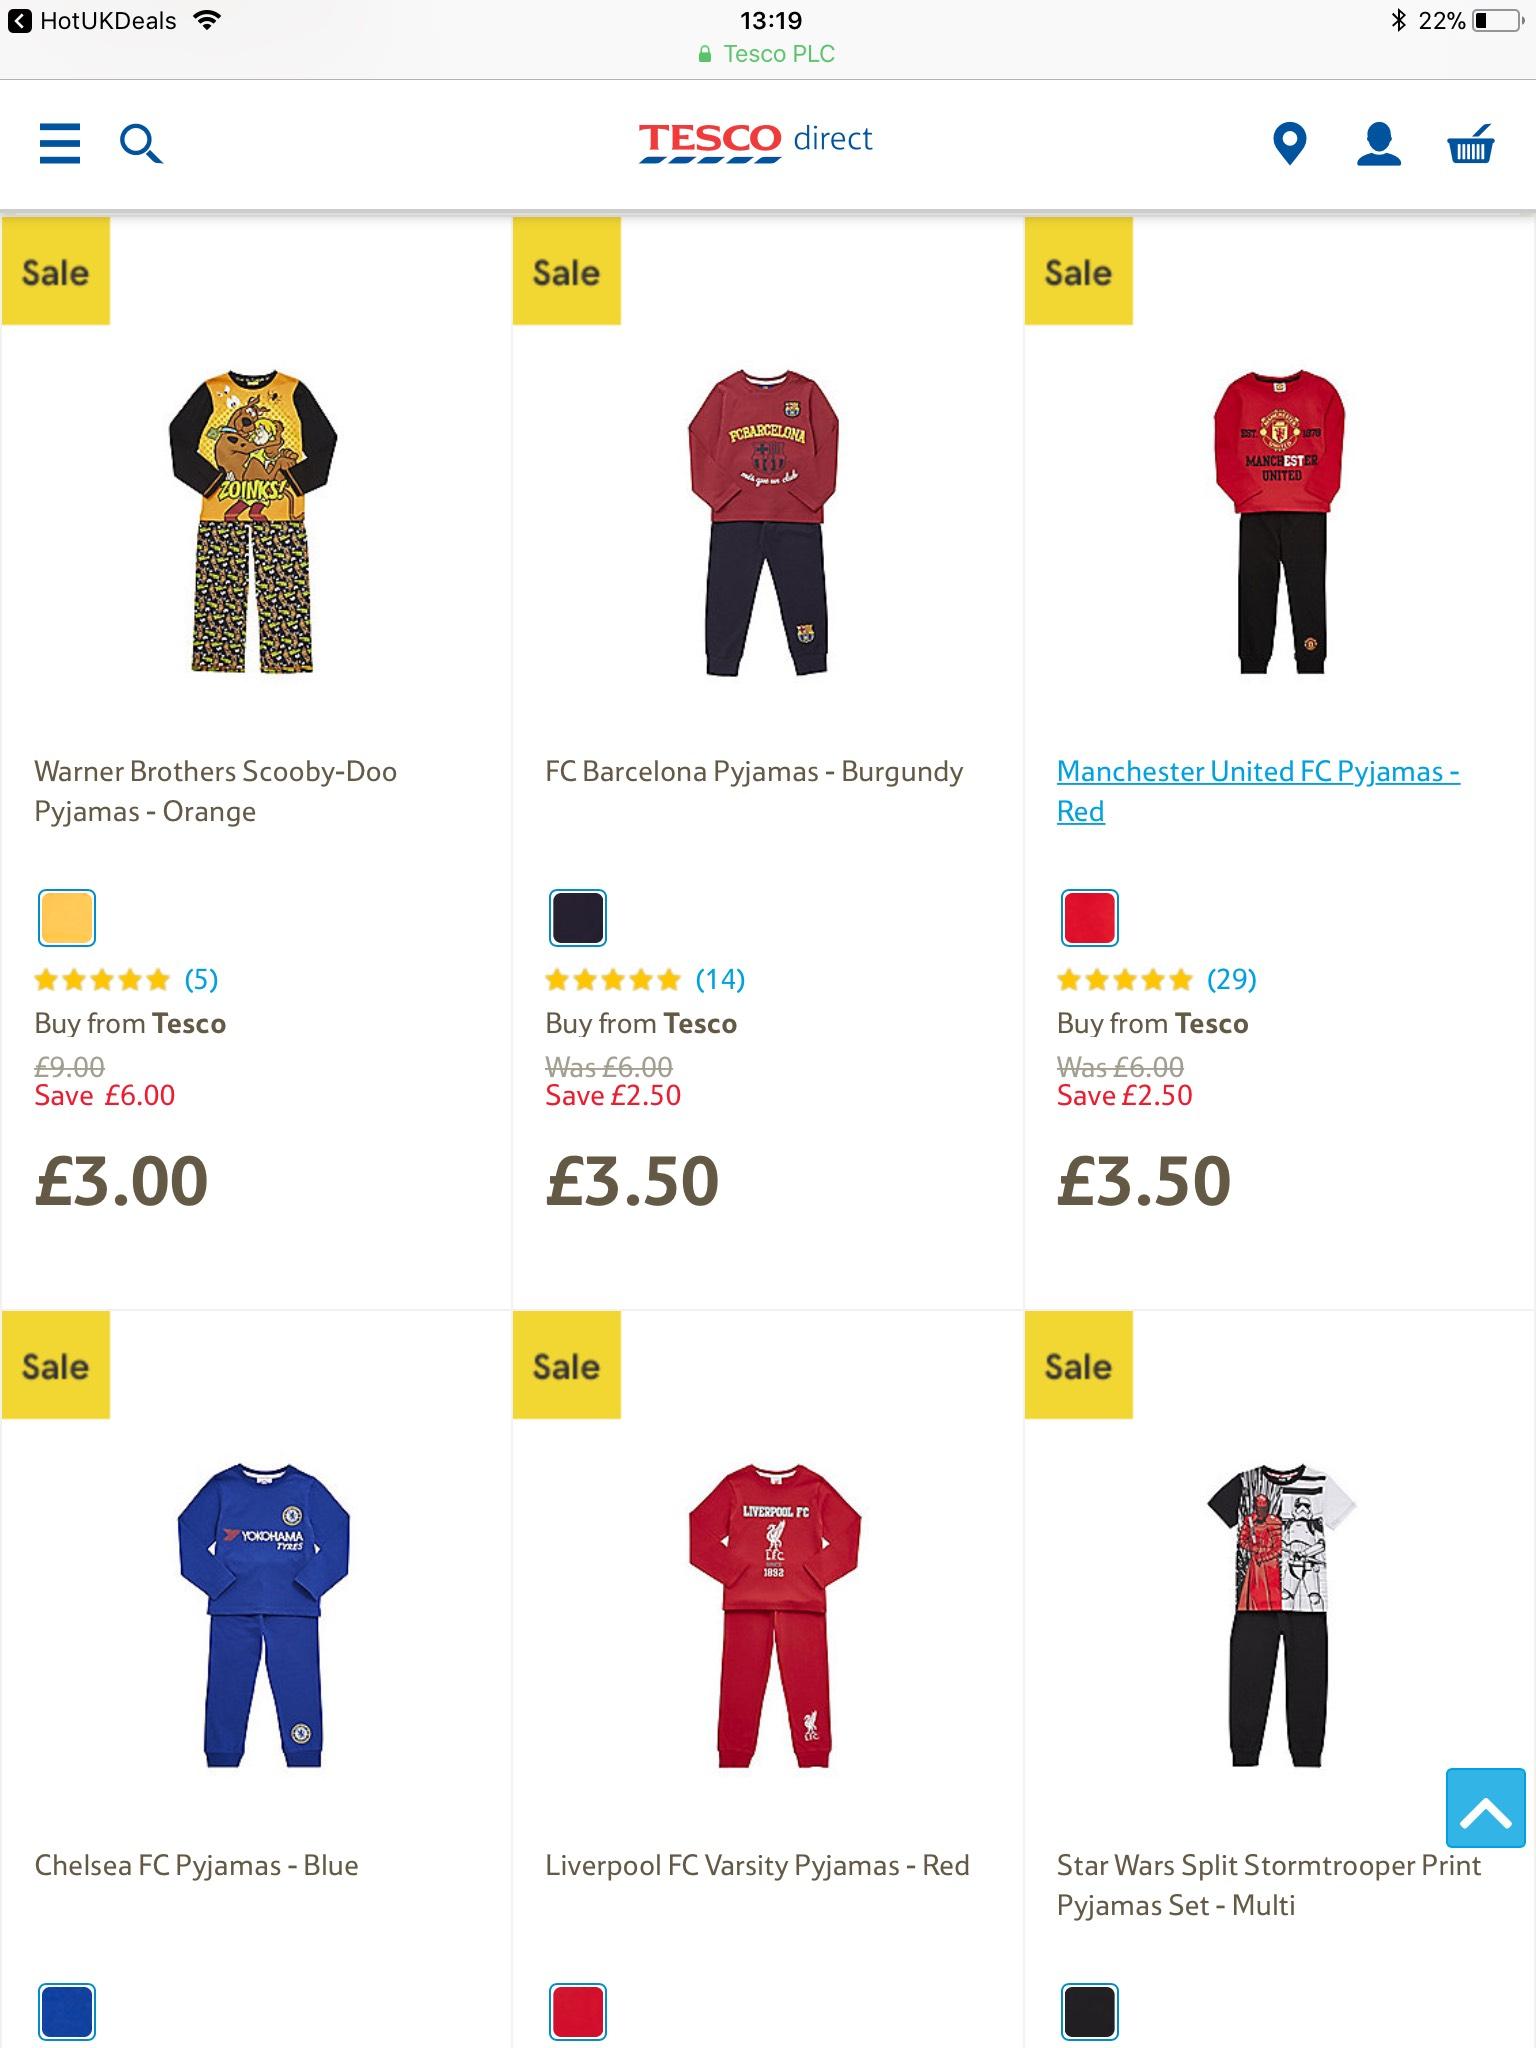 Various boys pj's SALE @ tesco direct - e.g Scooby-Doo Pyjamas £3.00